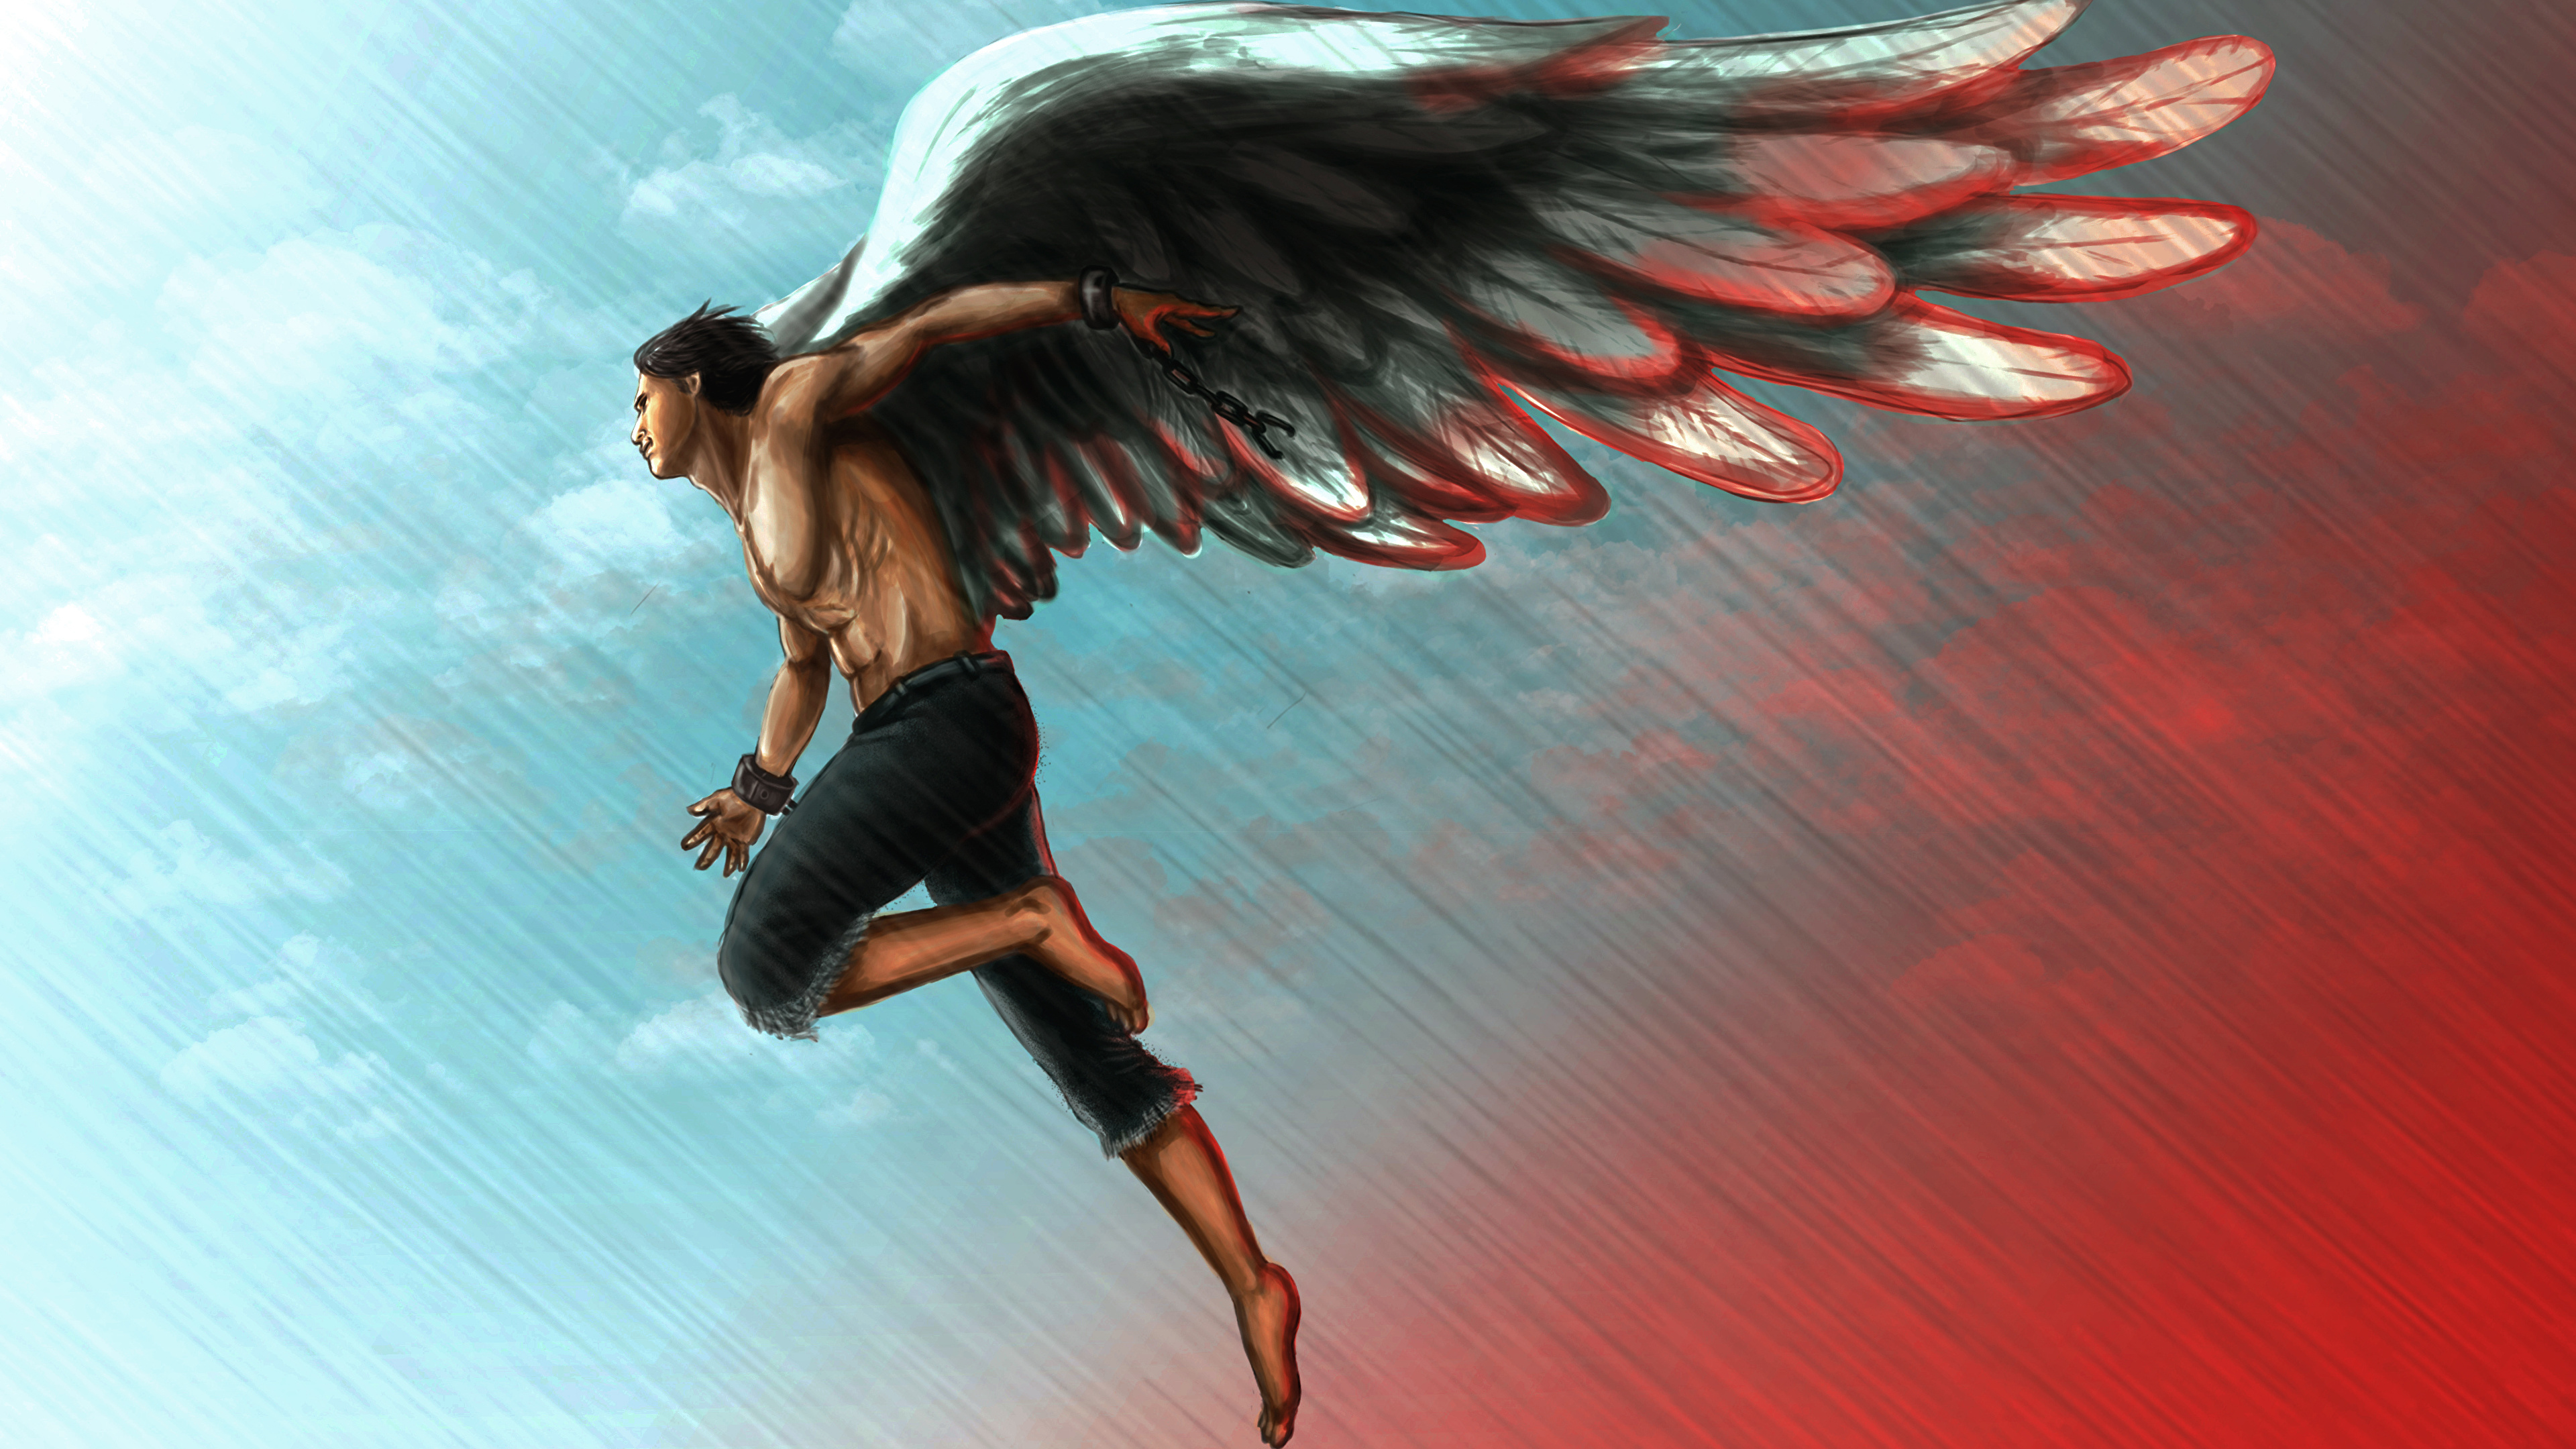 Images Men Wings Fantasy angel Painting Art 3840x2160 3840x2160